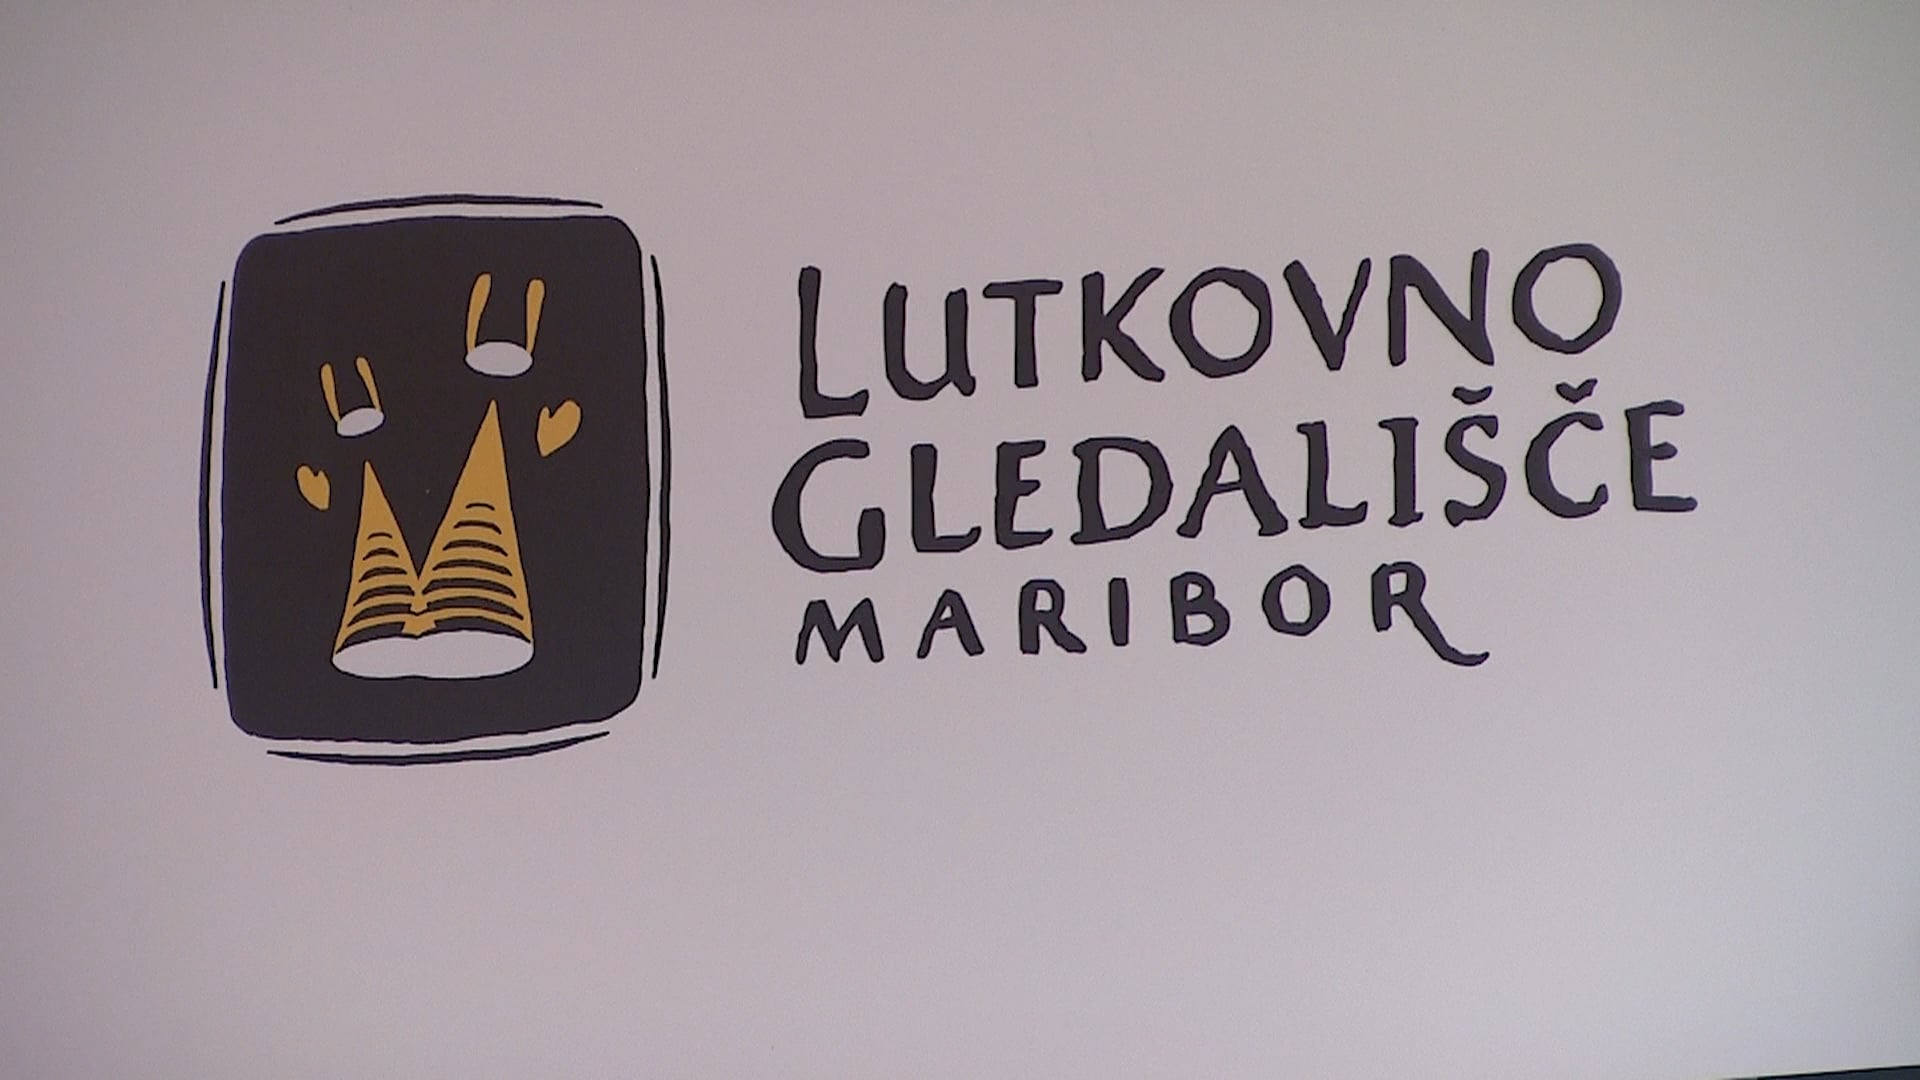 Nova sezona v Lutkovnem gledališču Maribor